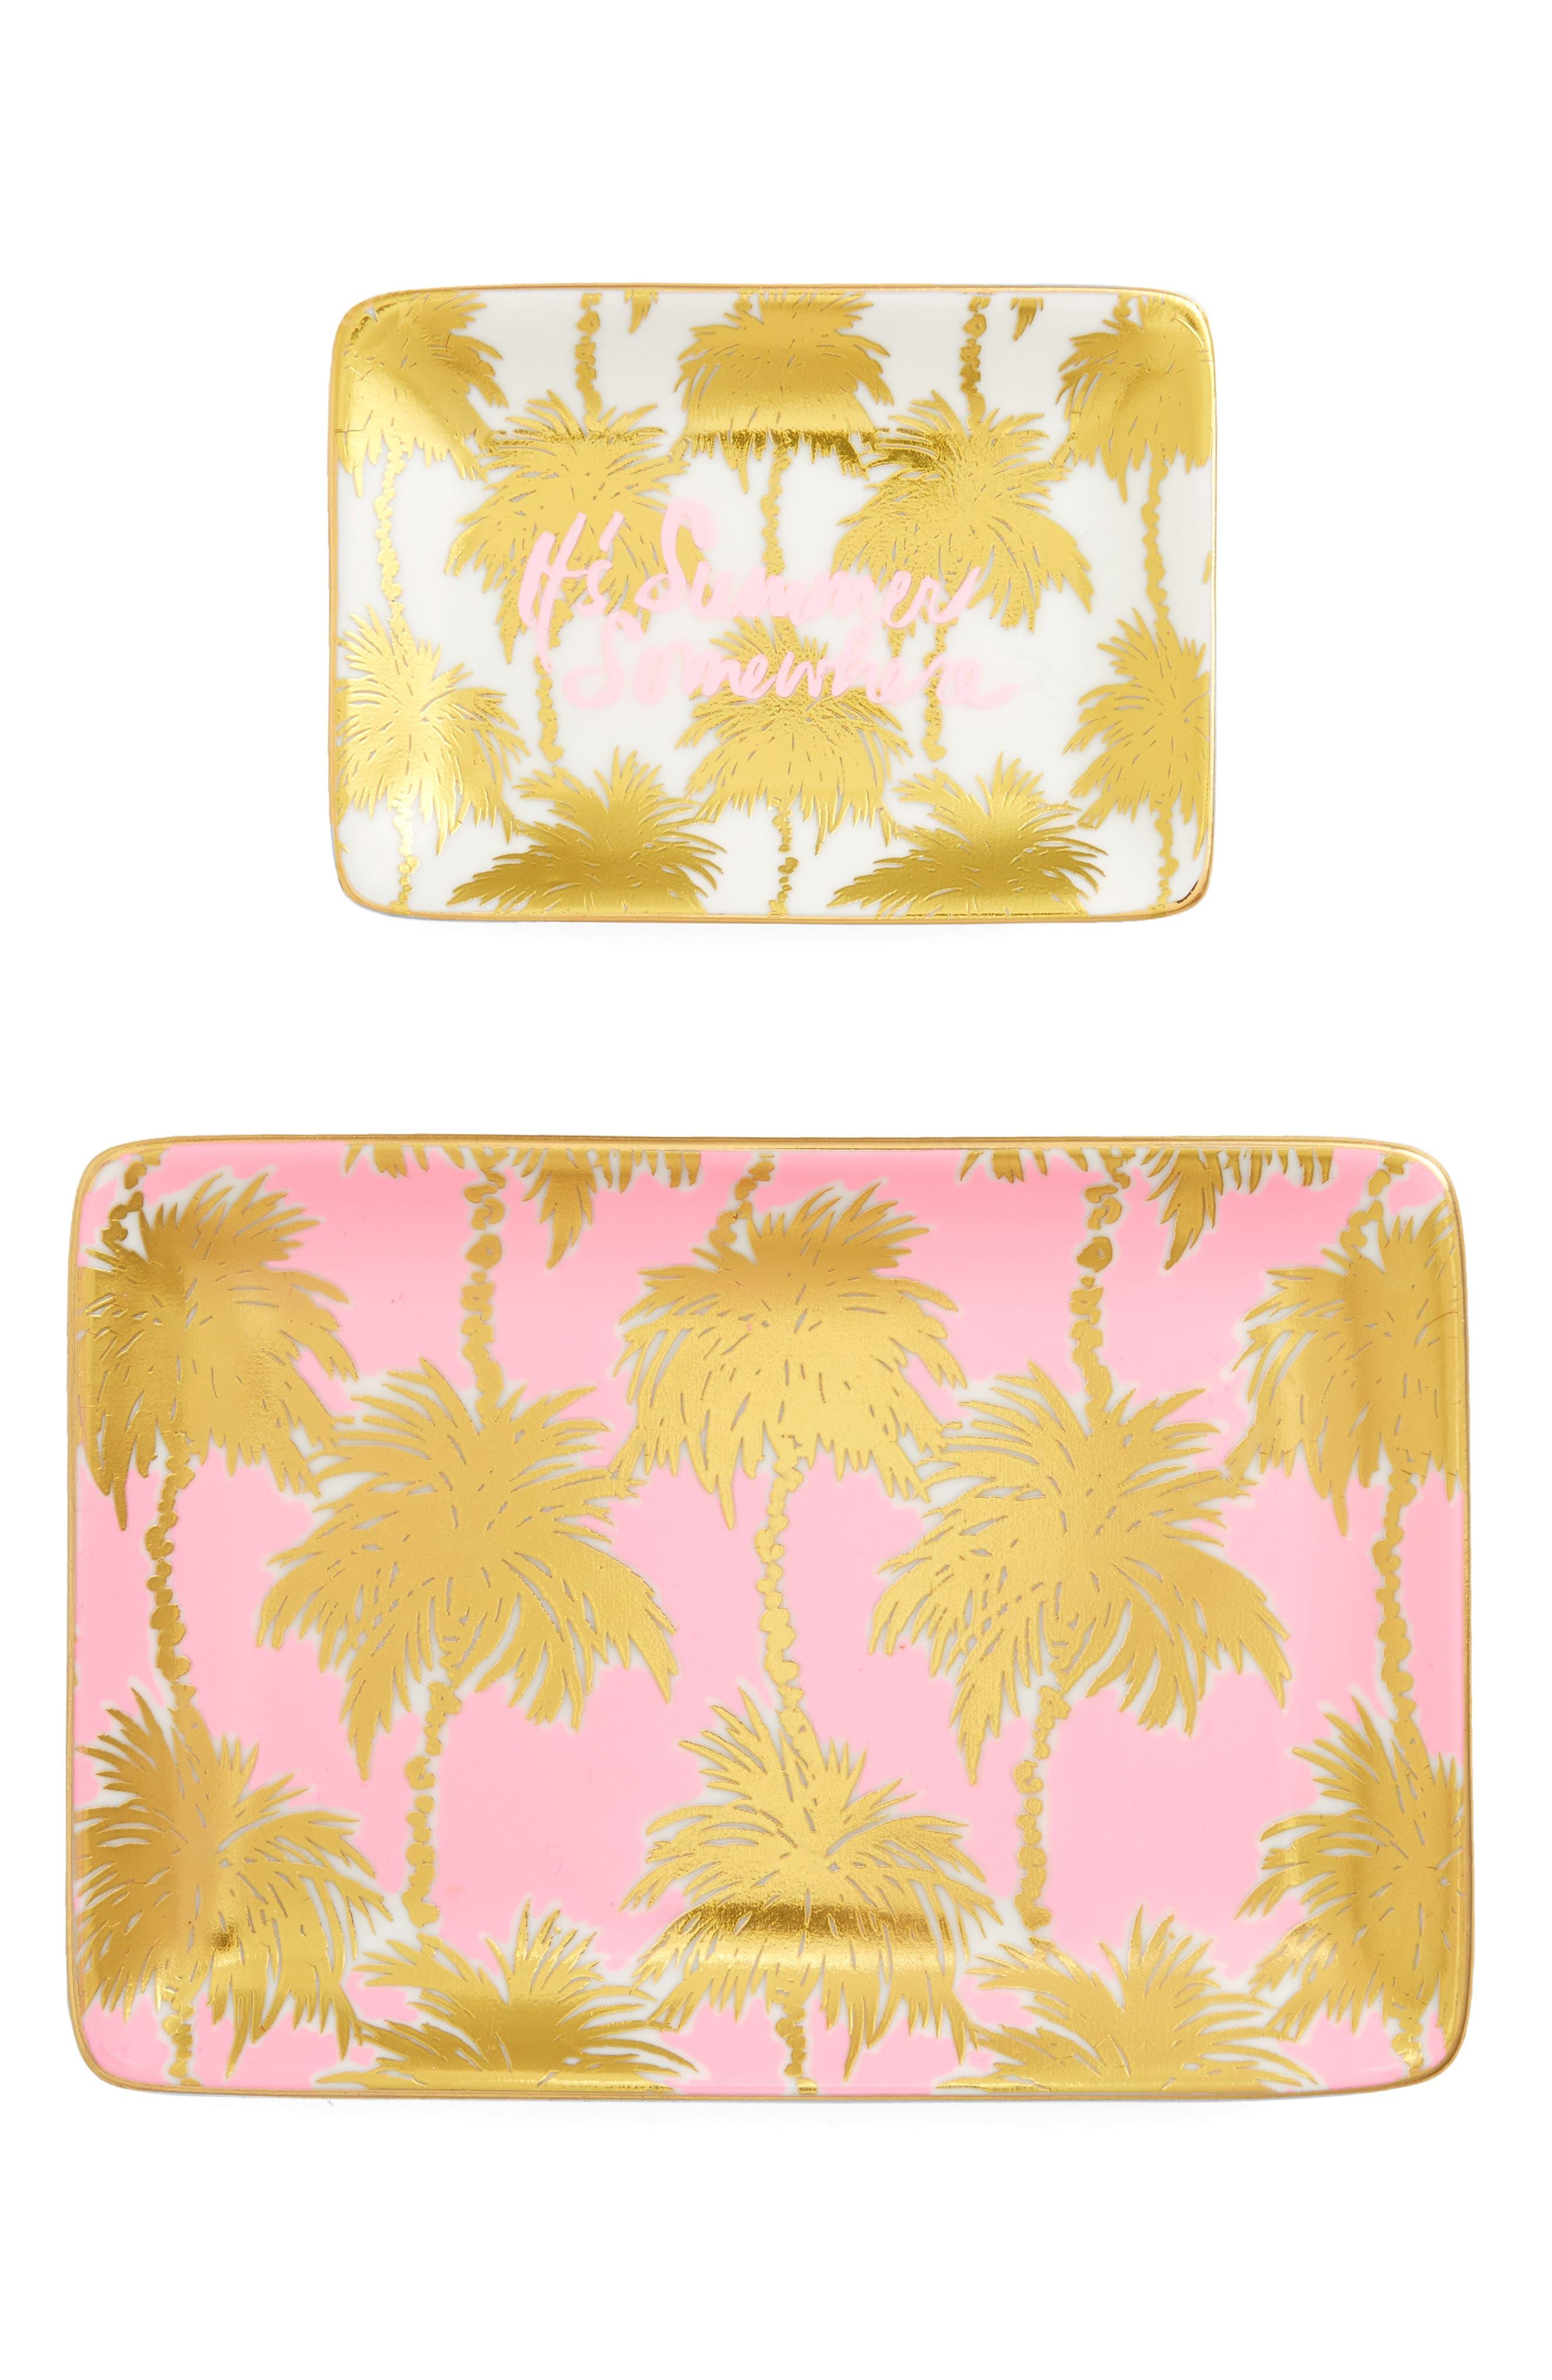 Alternate Image 1 Selected - Lilly Pulitzer® Set of 2 Ceramic Trinket Trays